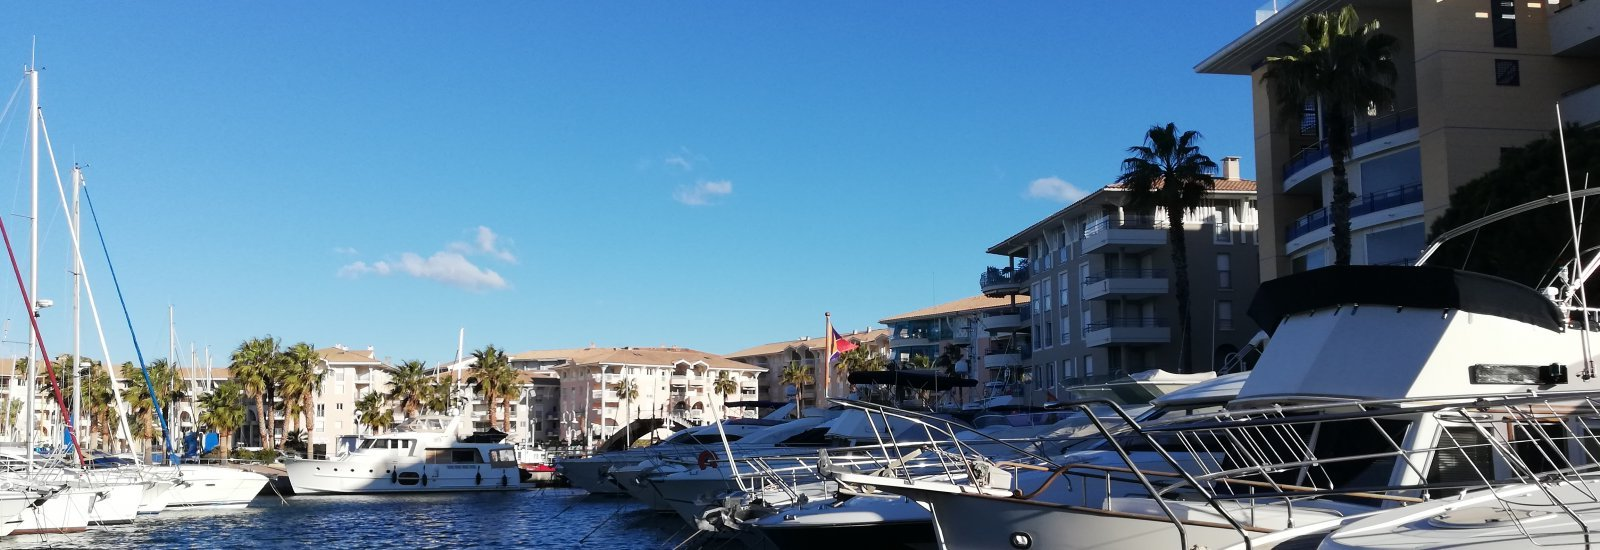 JMA Yachting Port-Fréjus Vente Location Bateaux neufs occasion